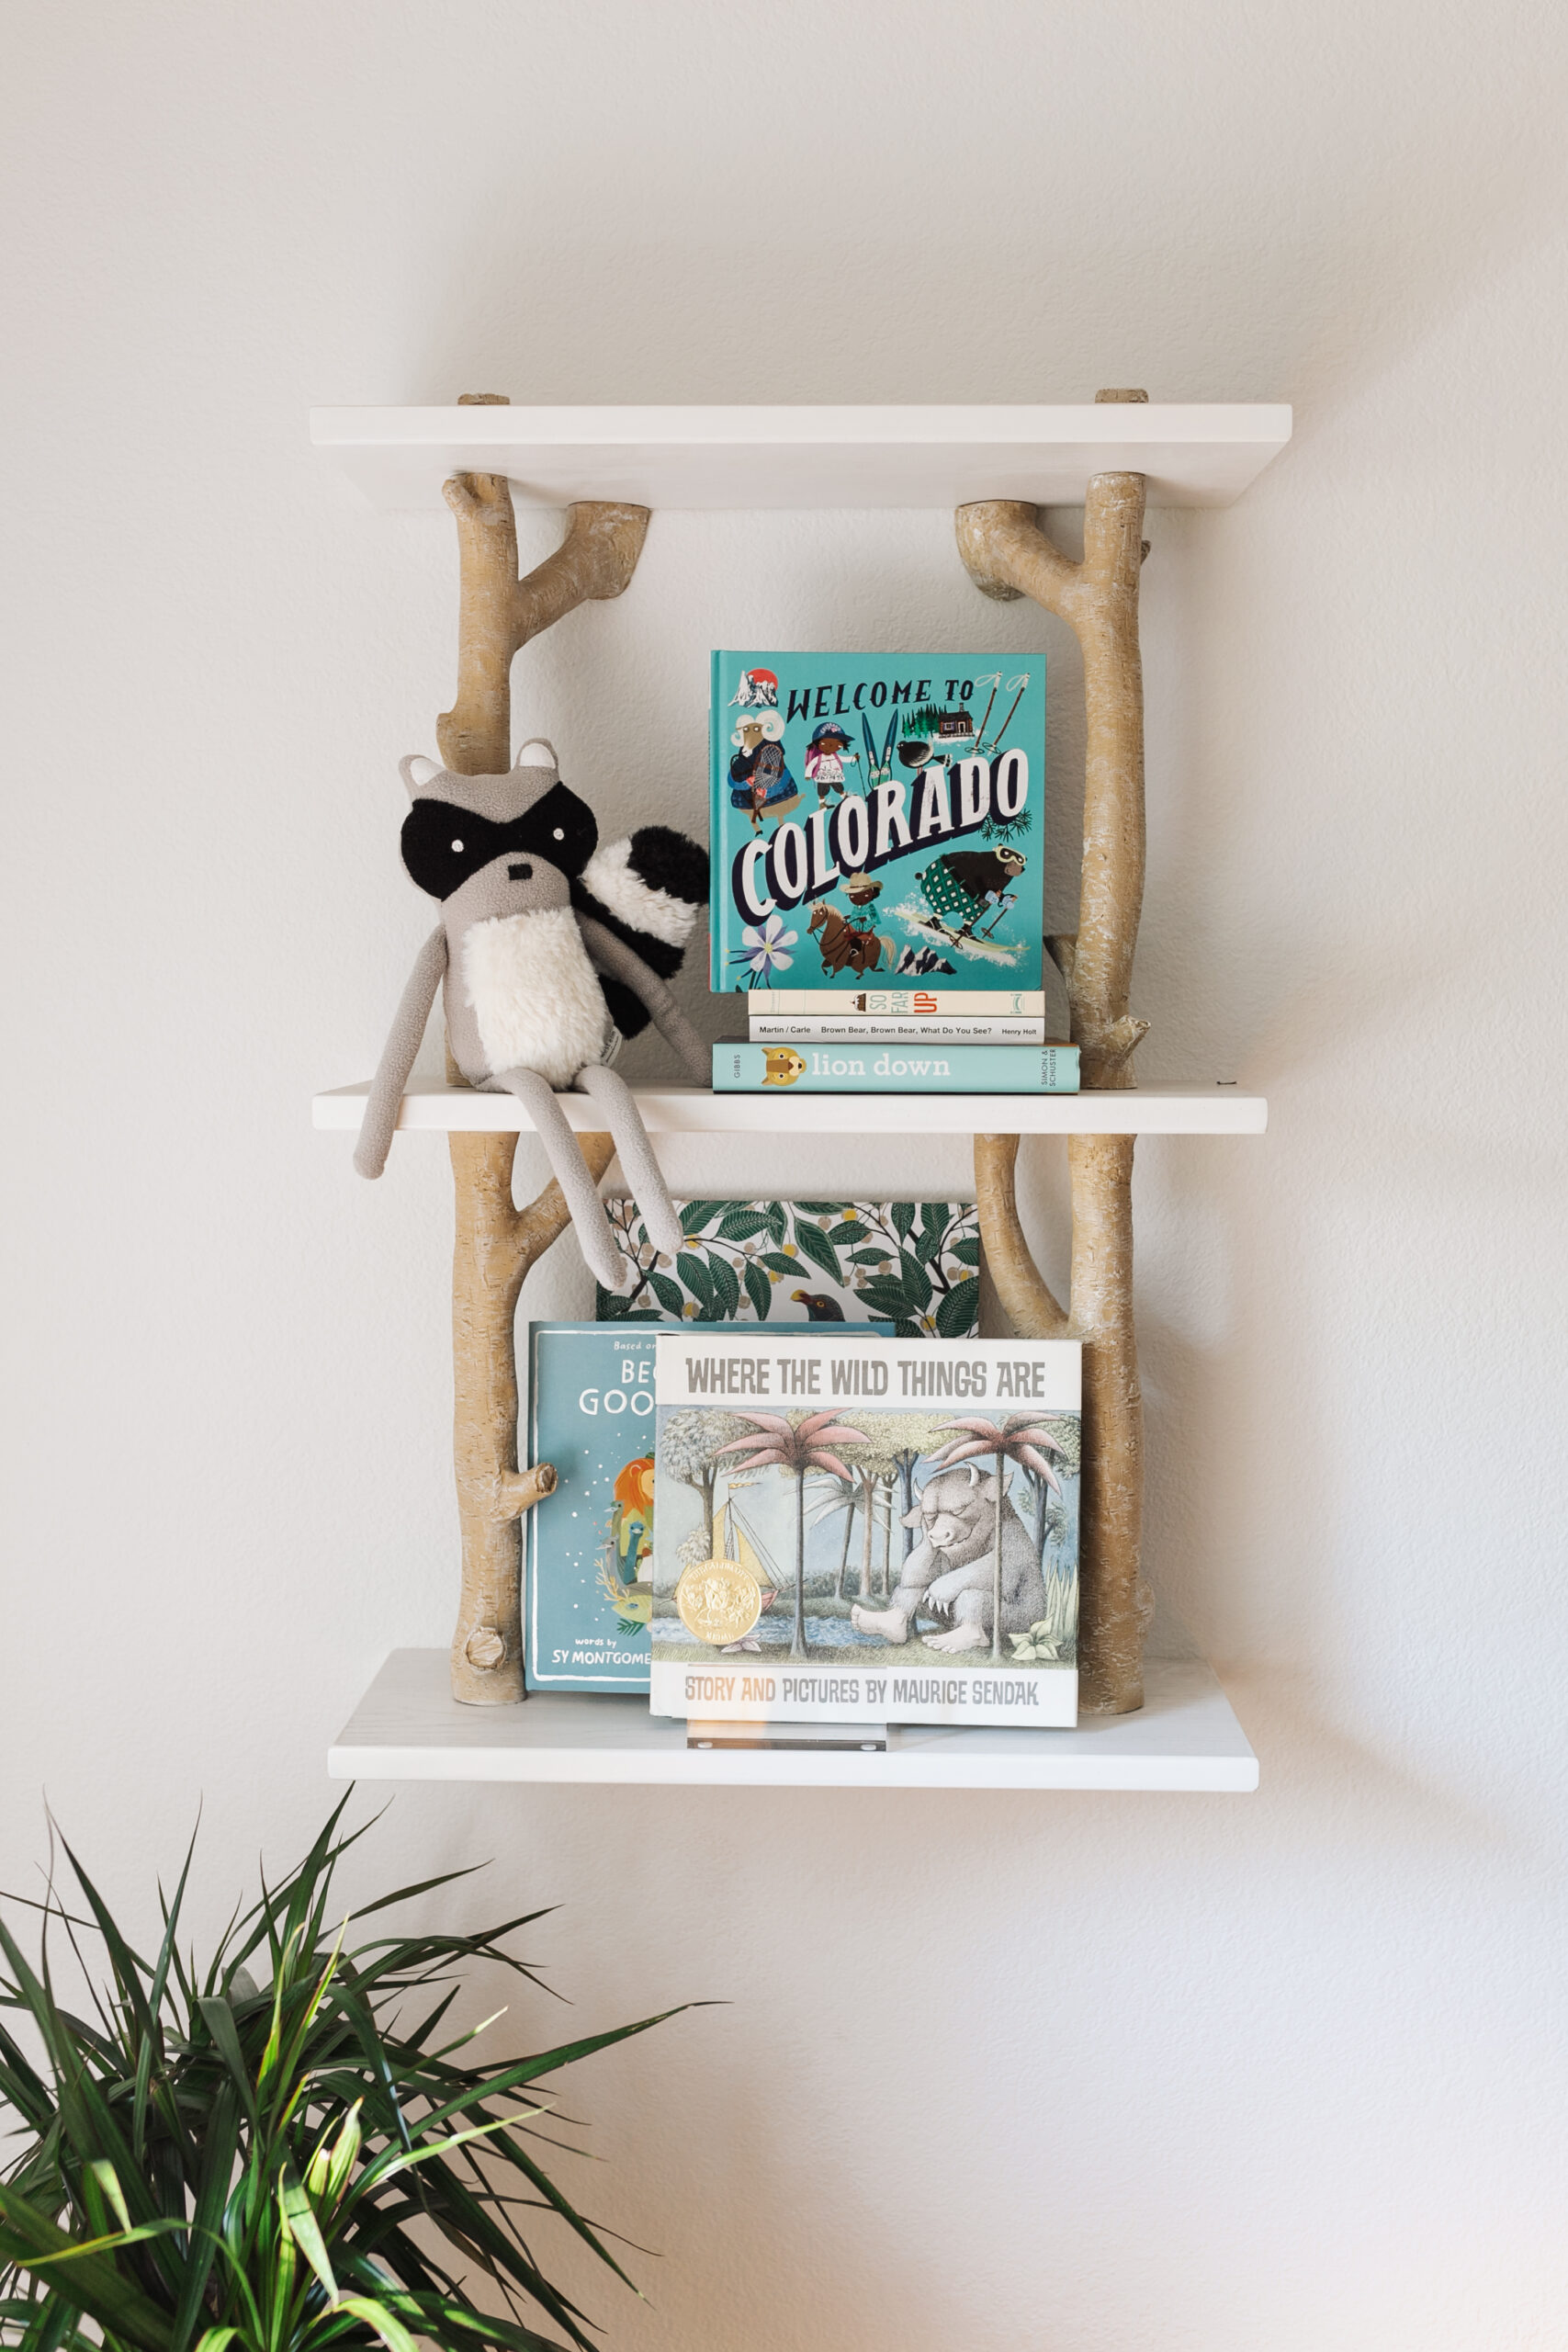 this sweet shelf for books and colorado touches #modernmountainhome #bunkroom #kidsroom #theldlhome